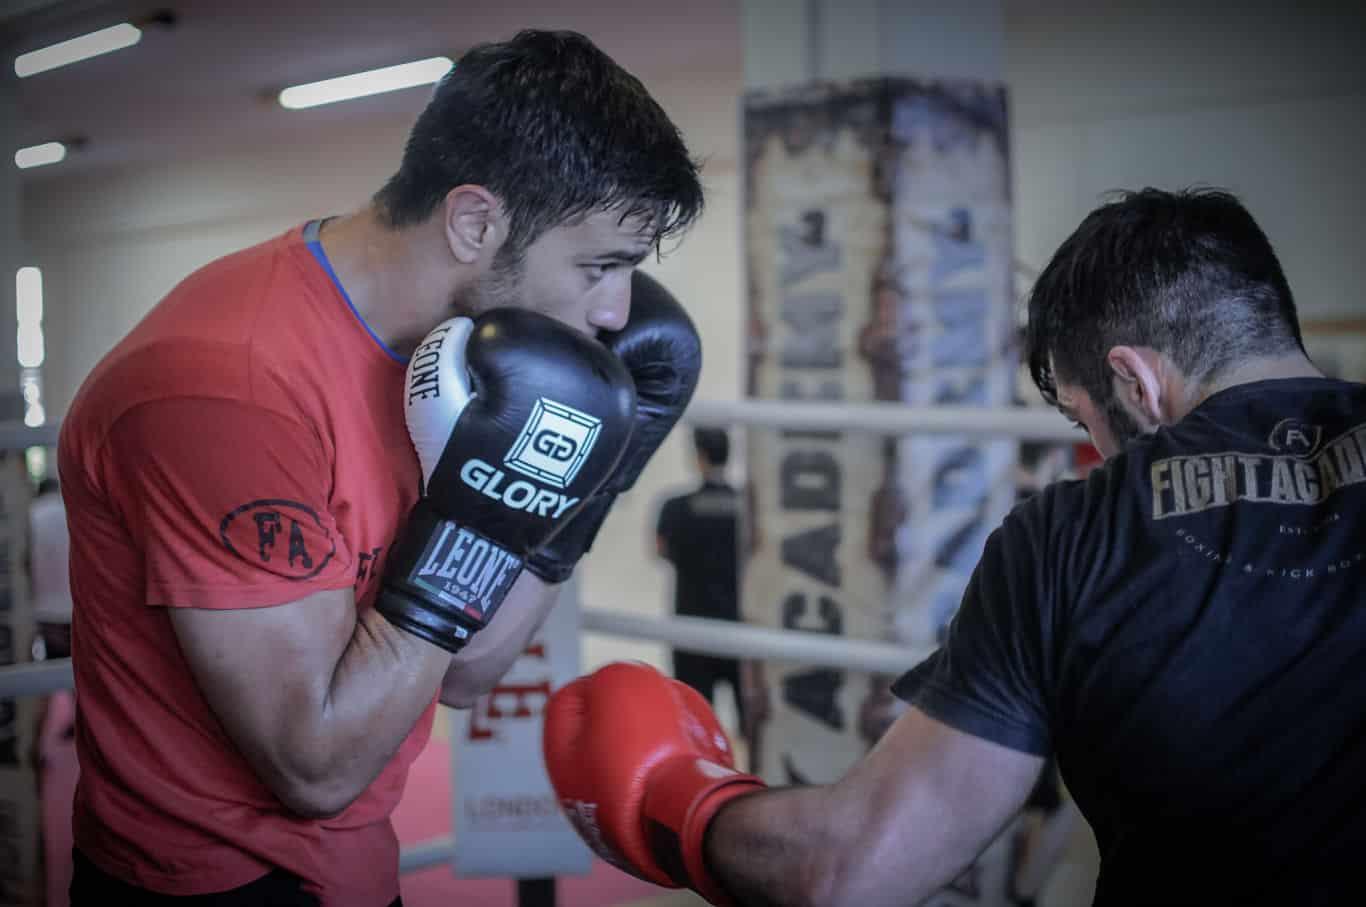 fight-academy-17_opt